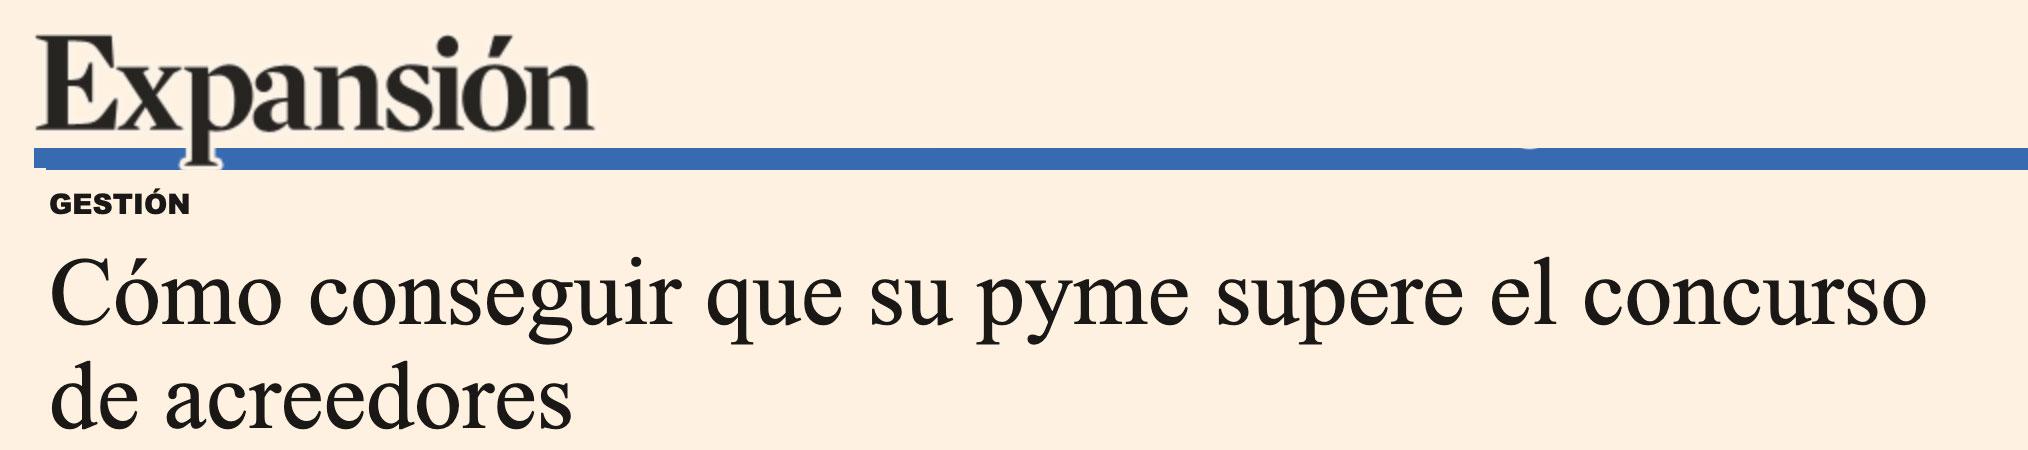 Concurso de acreedores en expansion para pymes